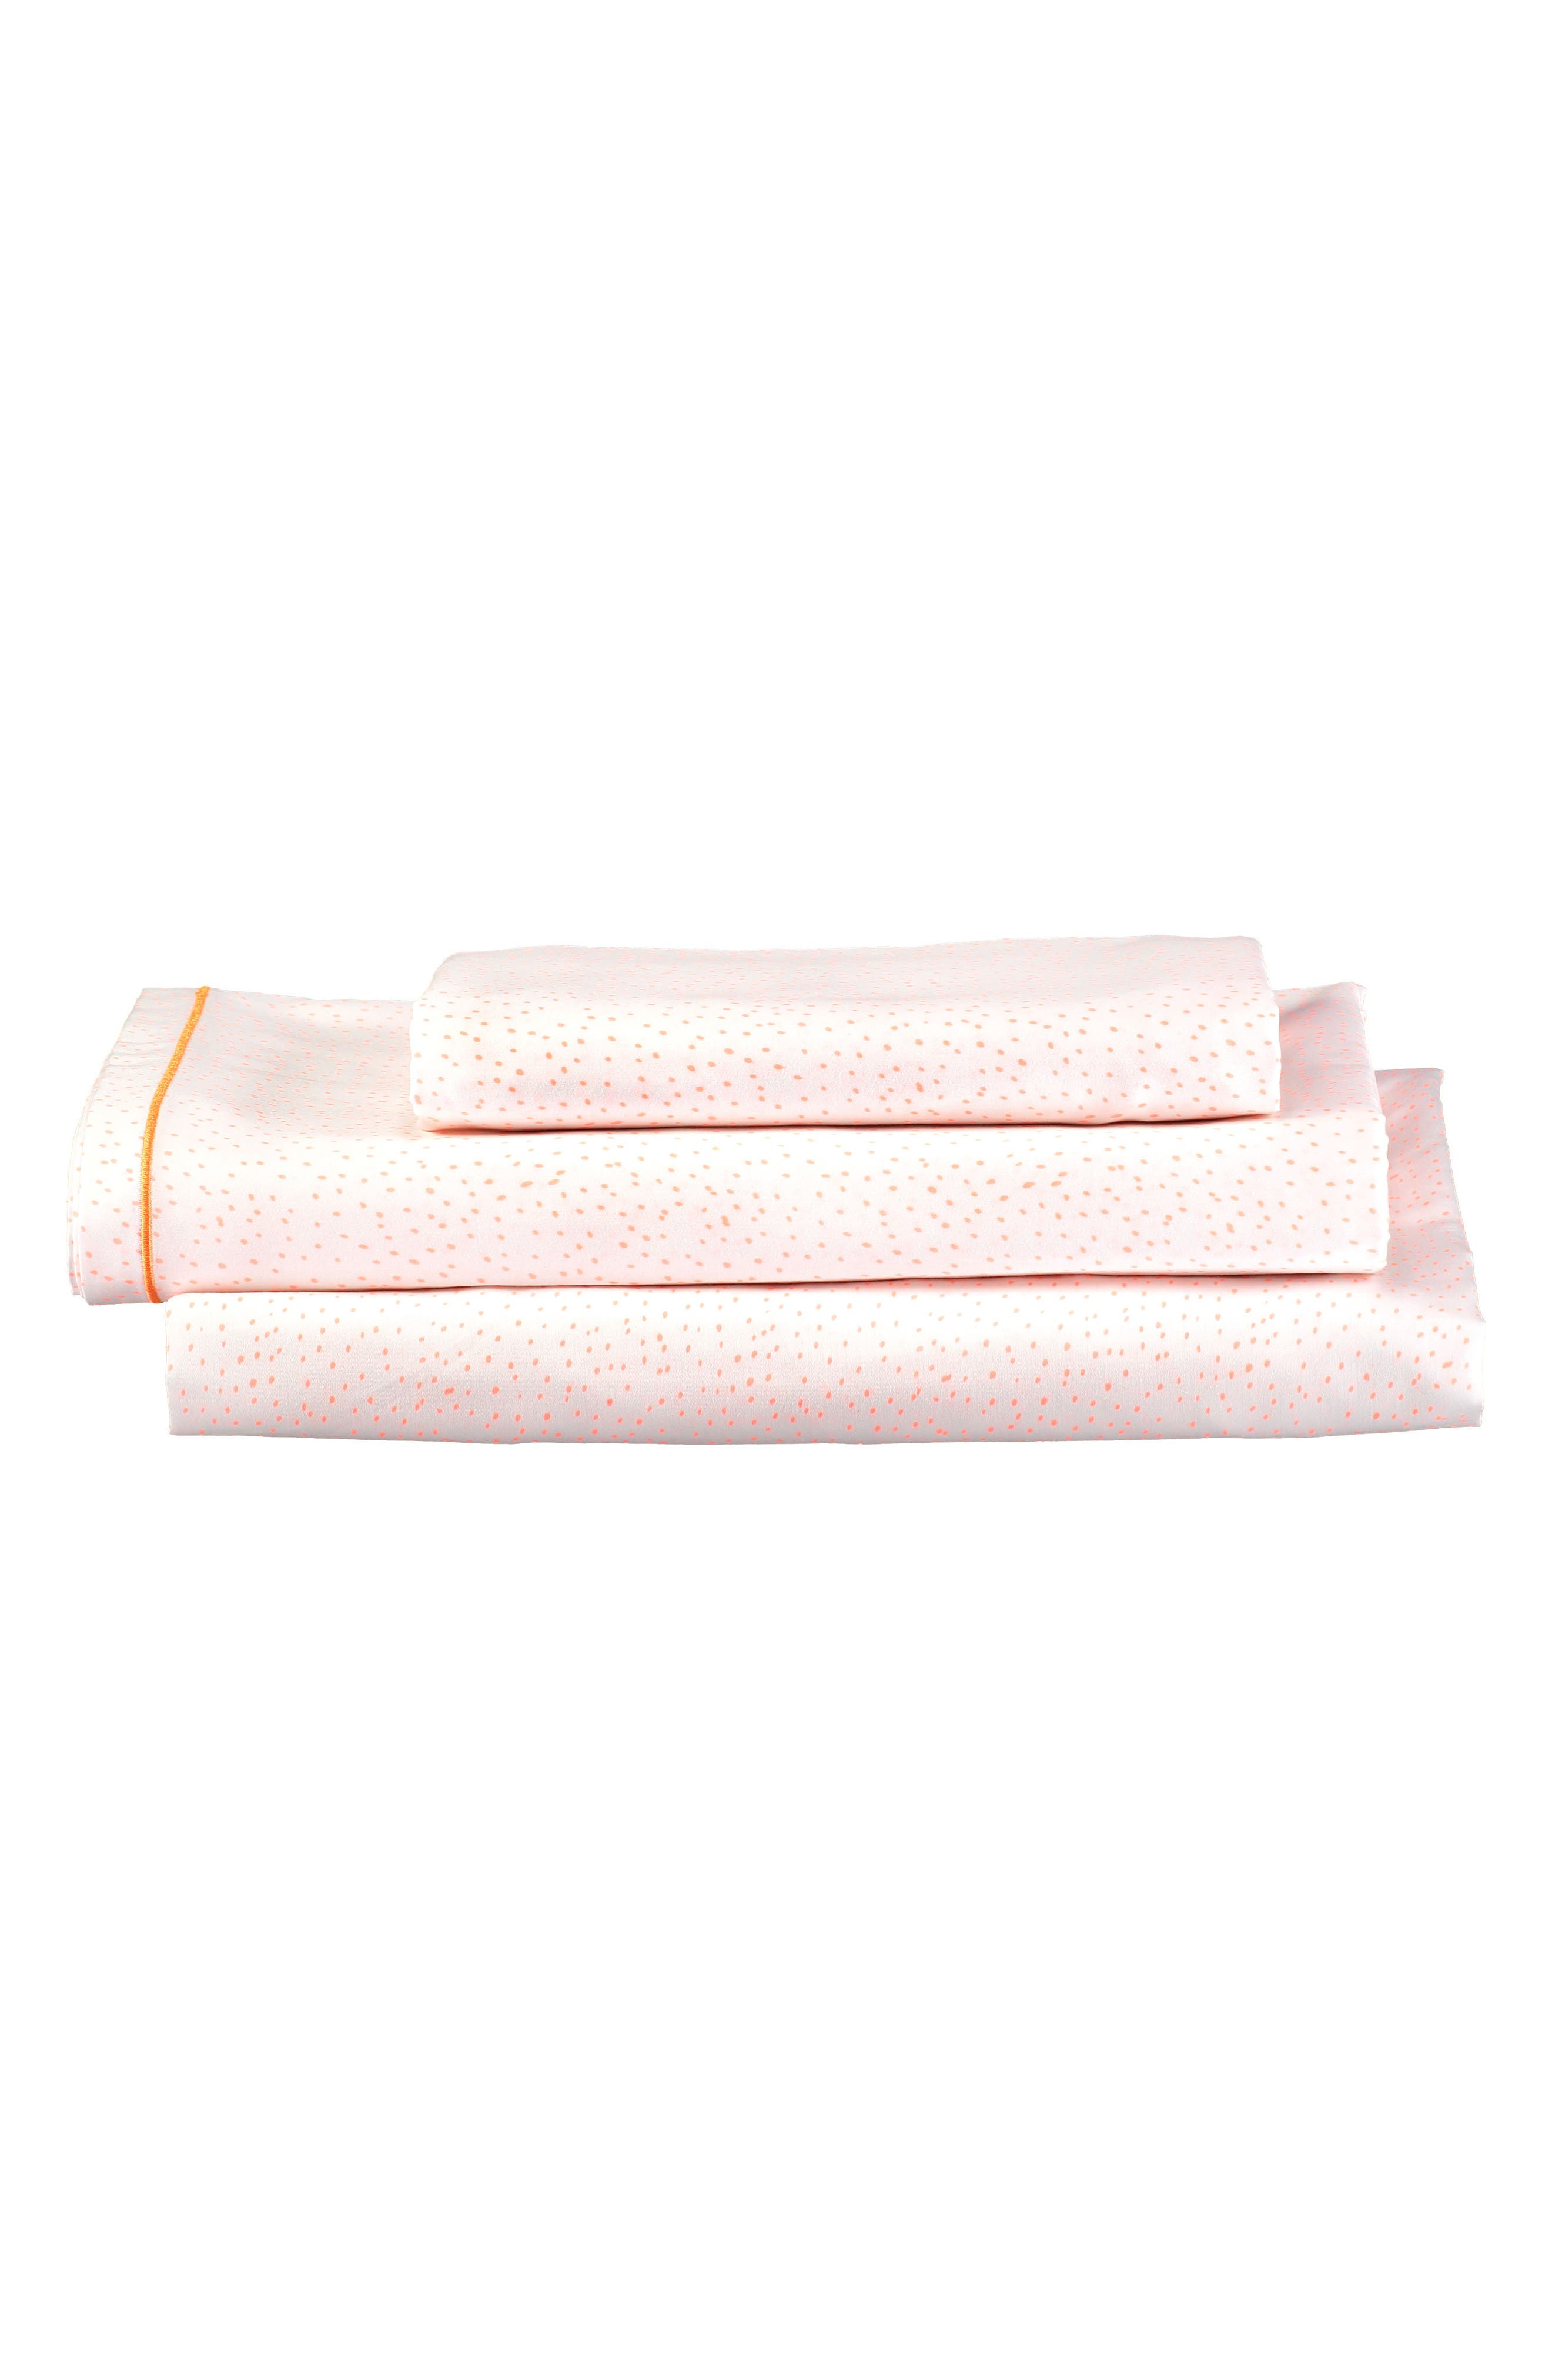 Twin Sheet & Pillowcase Set,                         Main,                         color, Coral